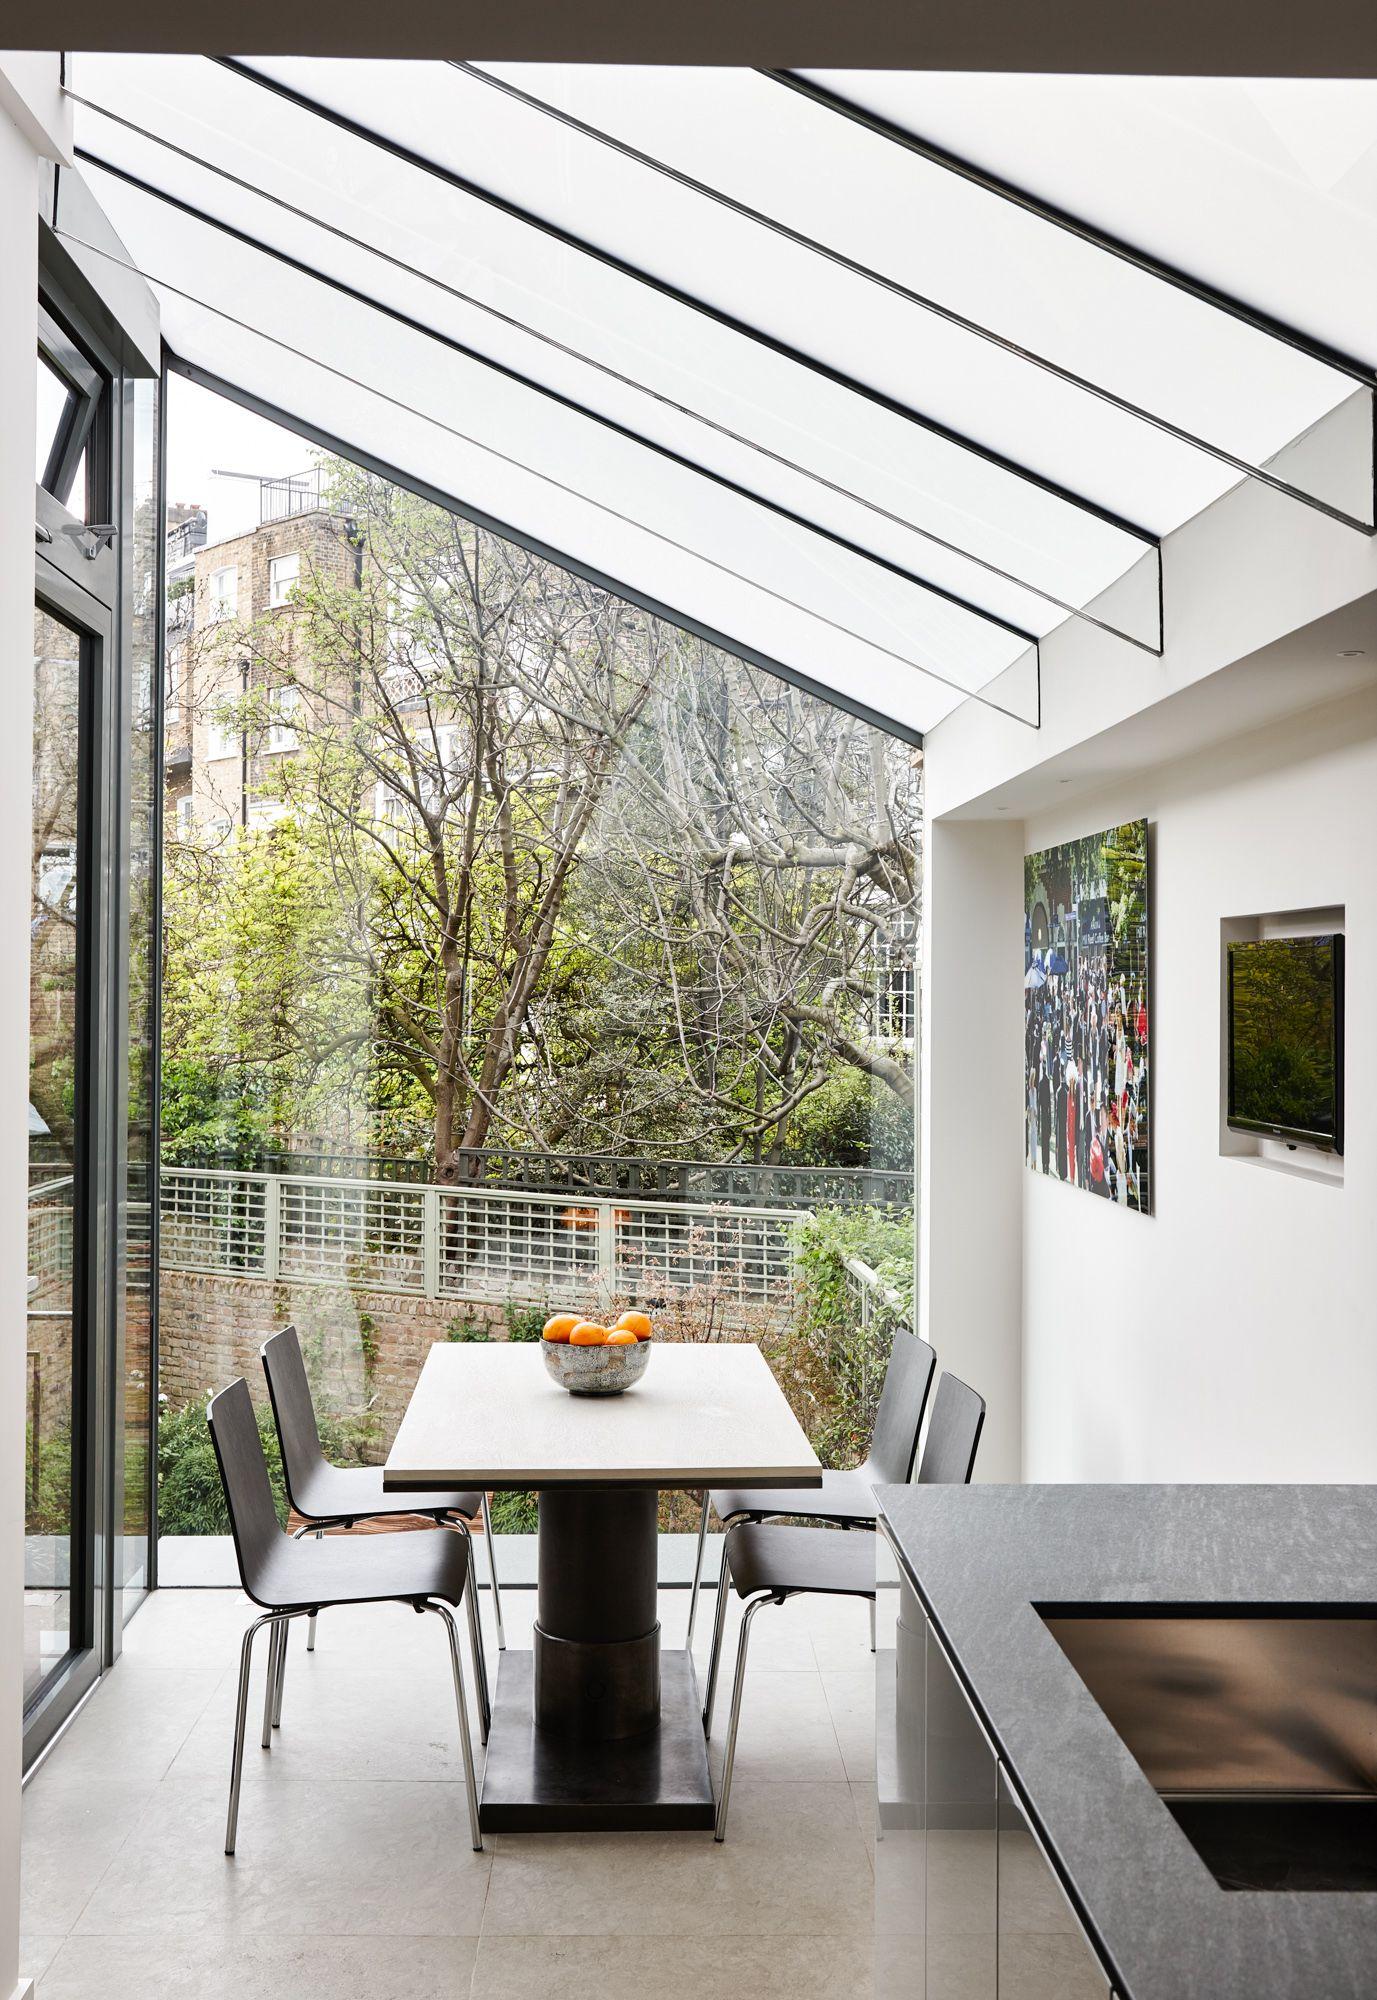 Best Trombe Internal Photo Of Structurally Glazed Modern 400 x 300